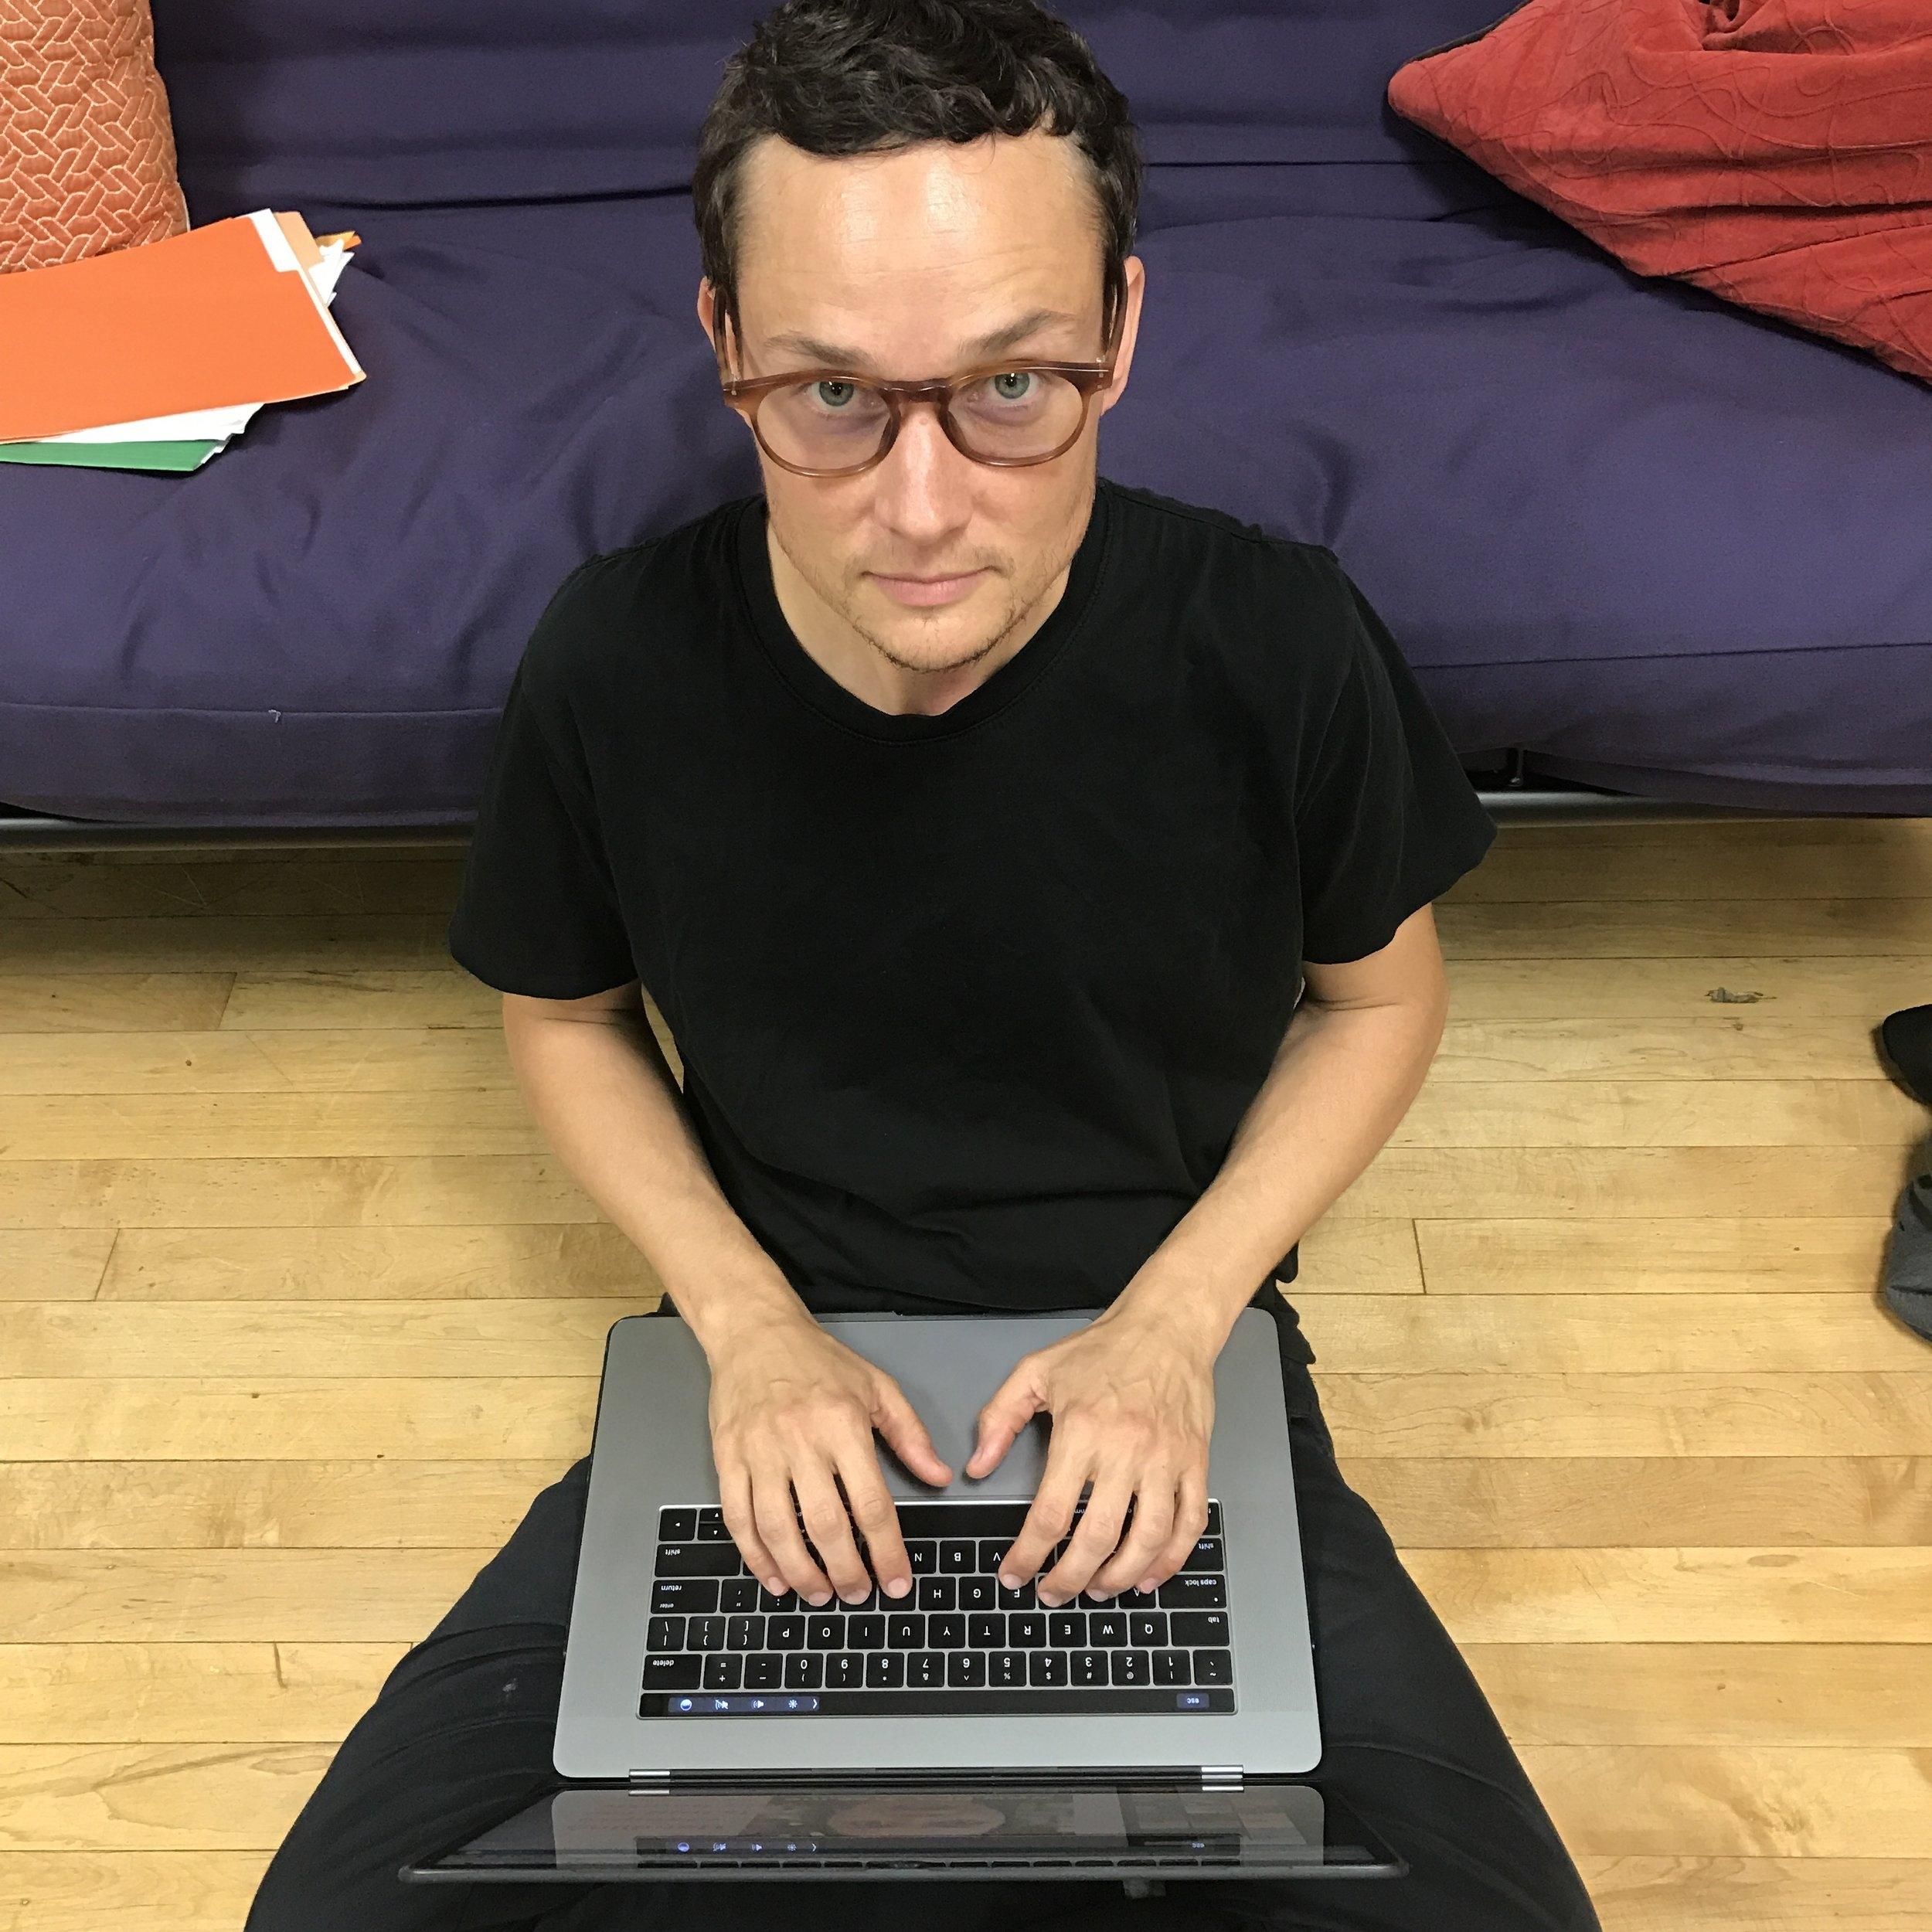 Elliot Montague - Former Program CoordinatorA Los Angeles transplant who loves making films but has a secret aversion to technology.